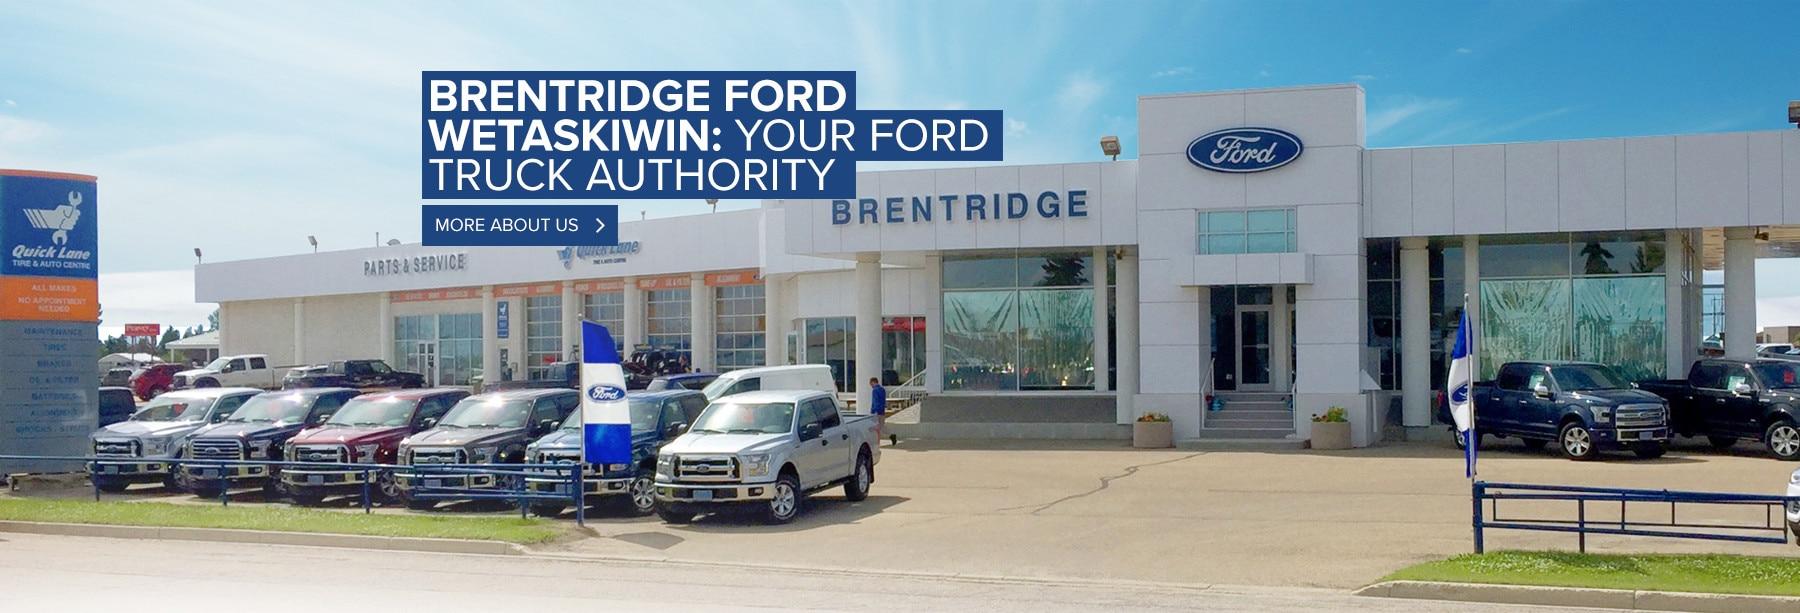 Brentridge Ford Wetaskiwin Ford Dealership Wetaskiwin AB | Near Edmonton